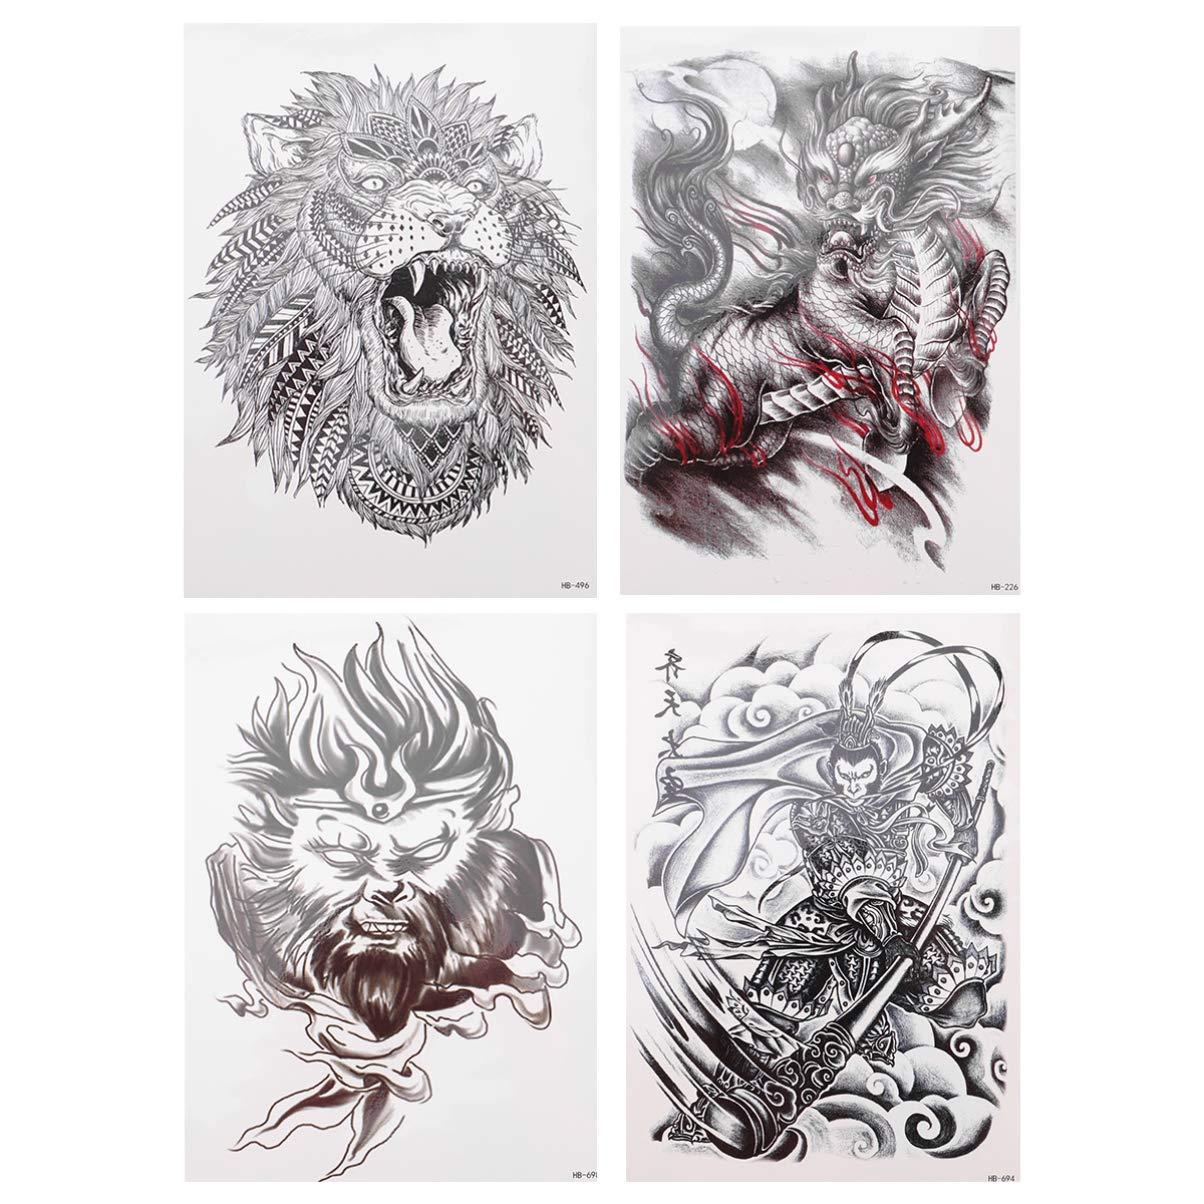 Lurrose 4Pcs Full Arm Tattoo Sticker Animal Fake Tattoos Sleeve Temporary Tattoo Body Art for Men Women Party Halloween Masquerade (White Black)